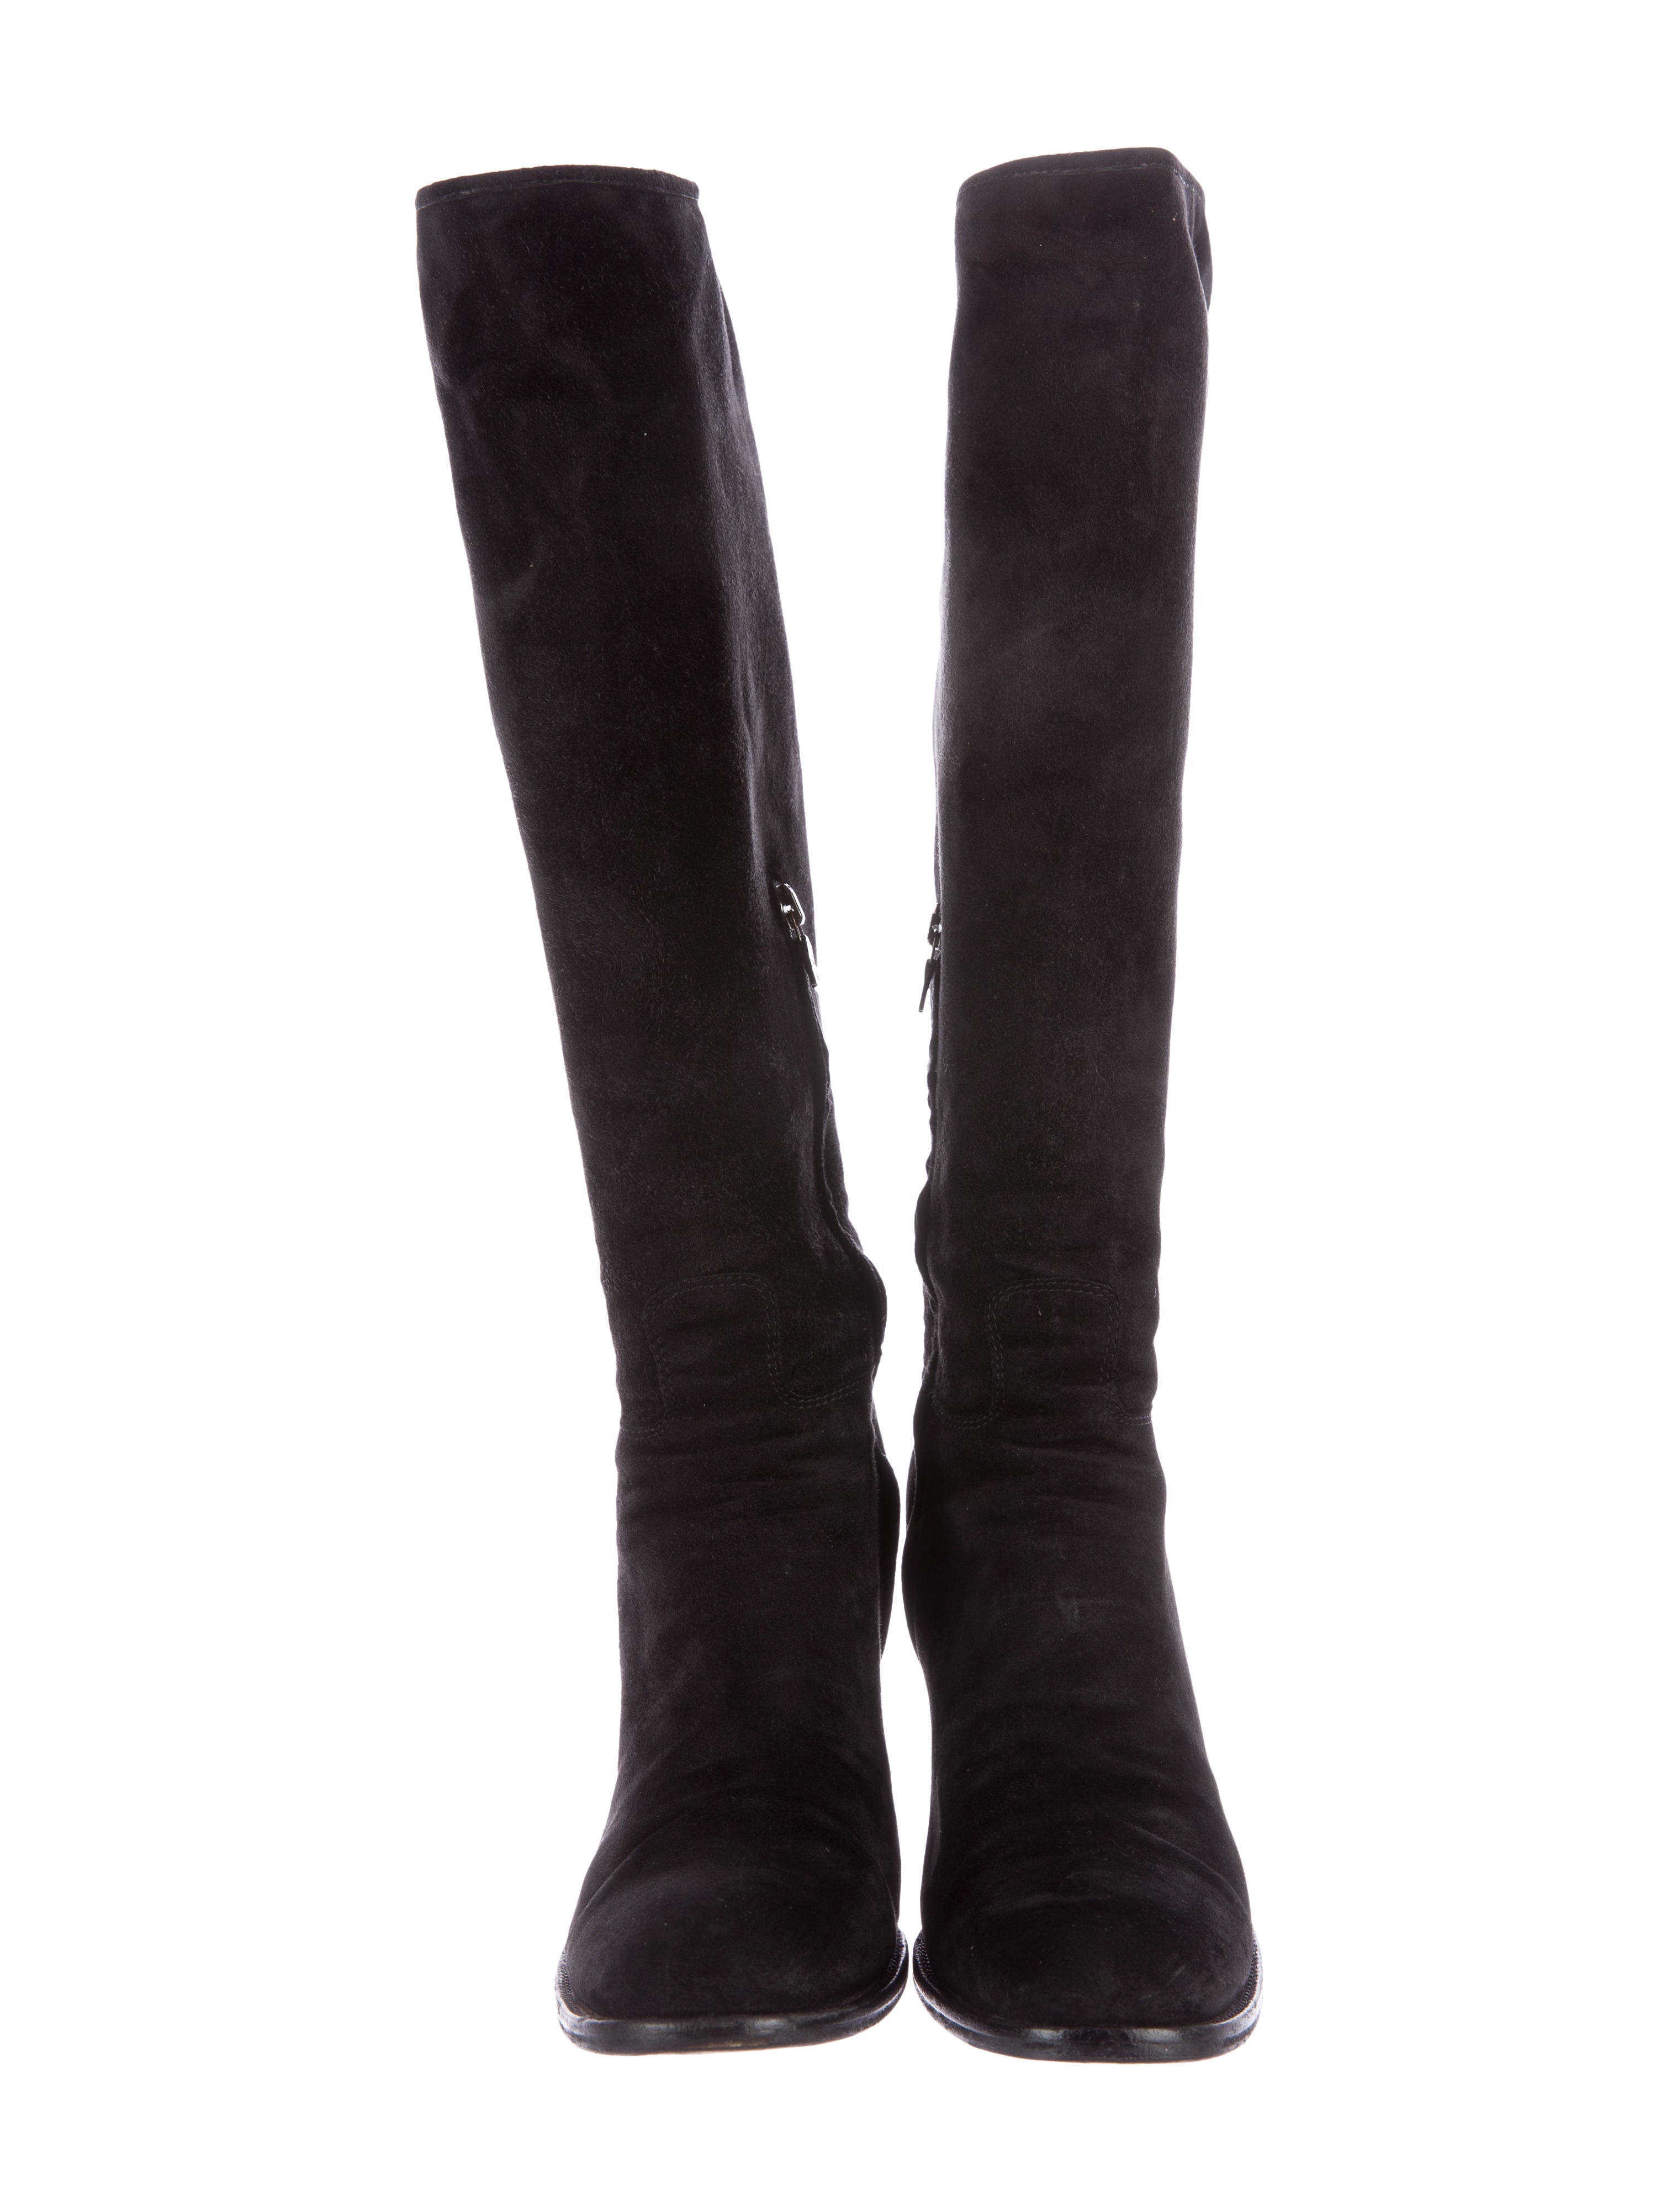 prada suede knee high boots shoes pra117176 the realreal